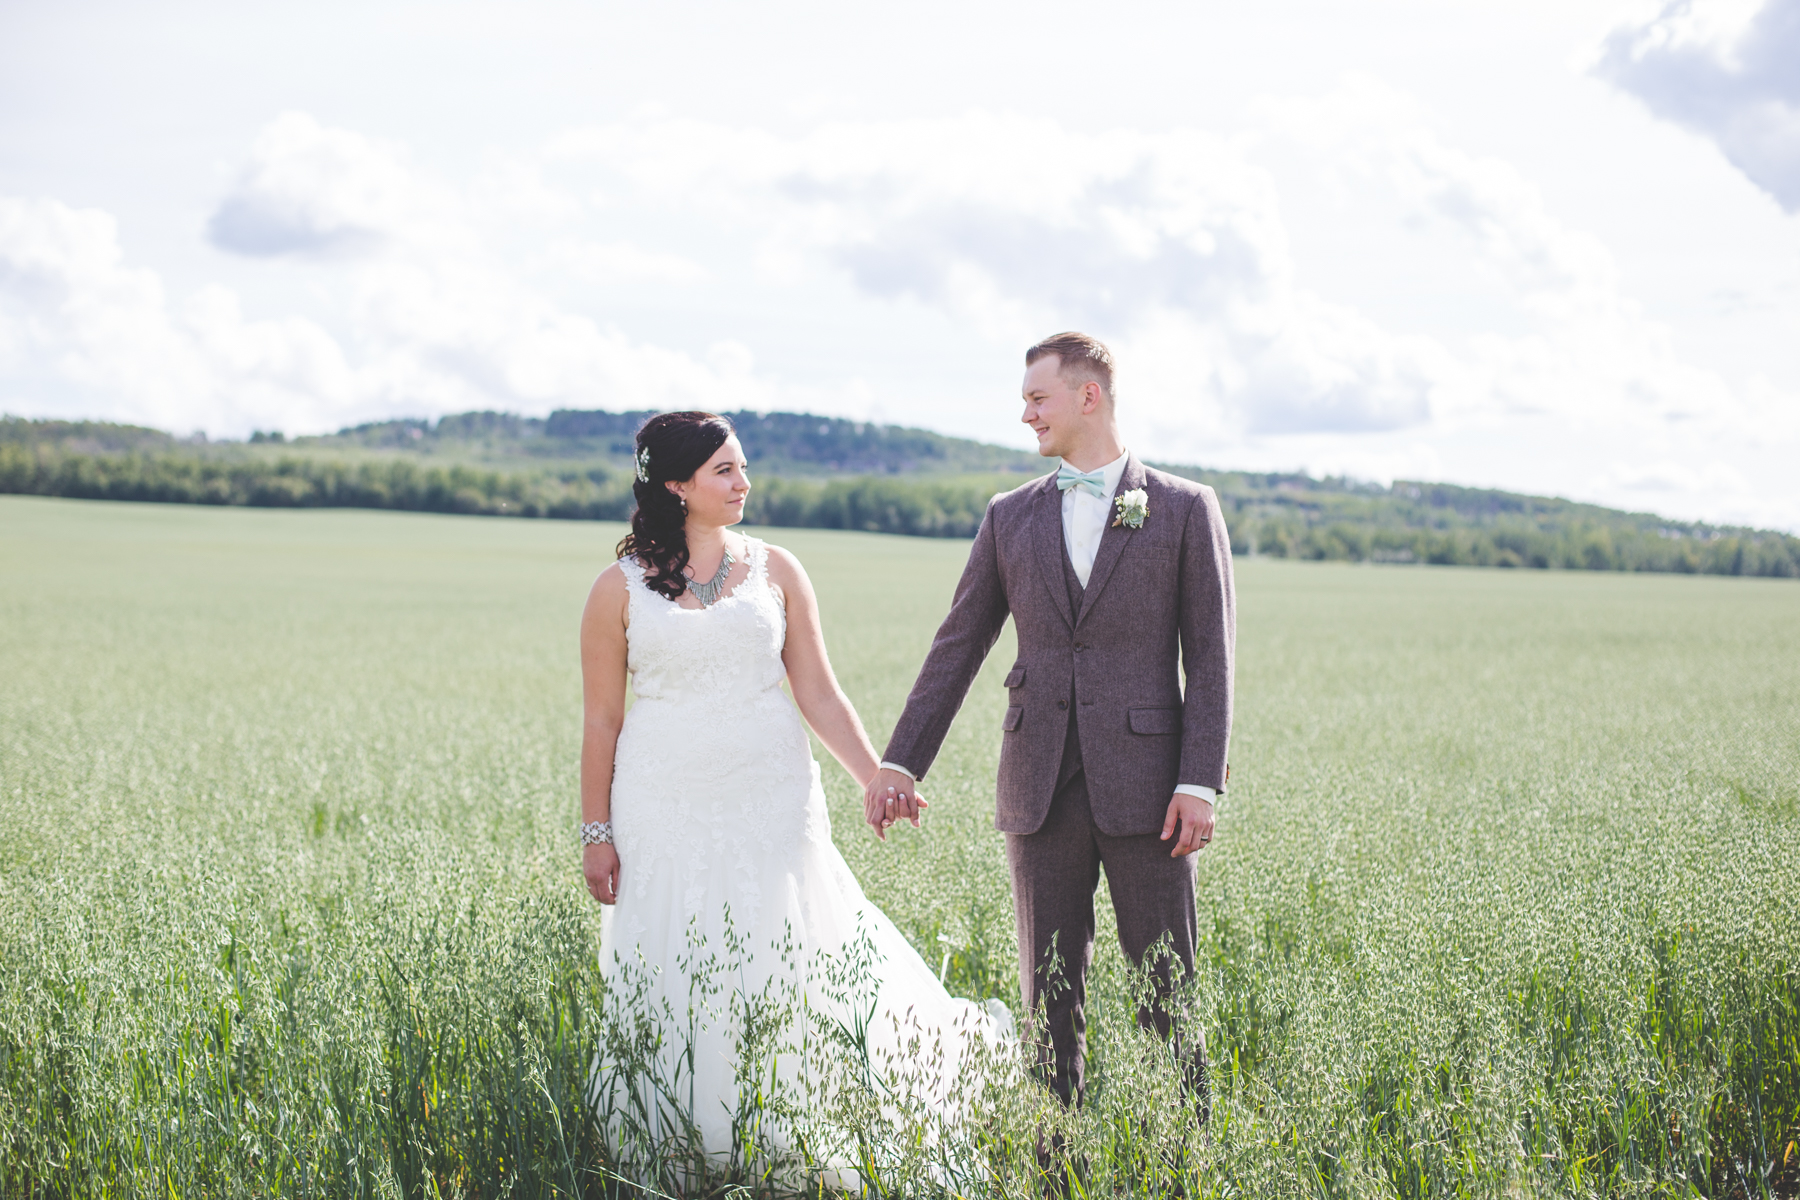 20150808-oglovewedding-1148.jpg